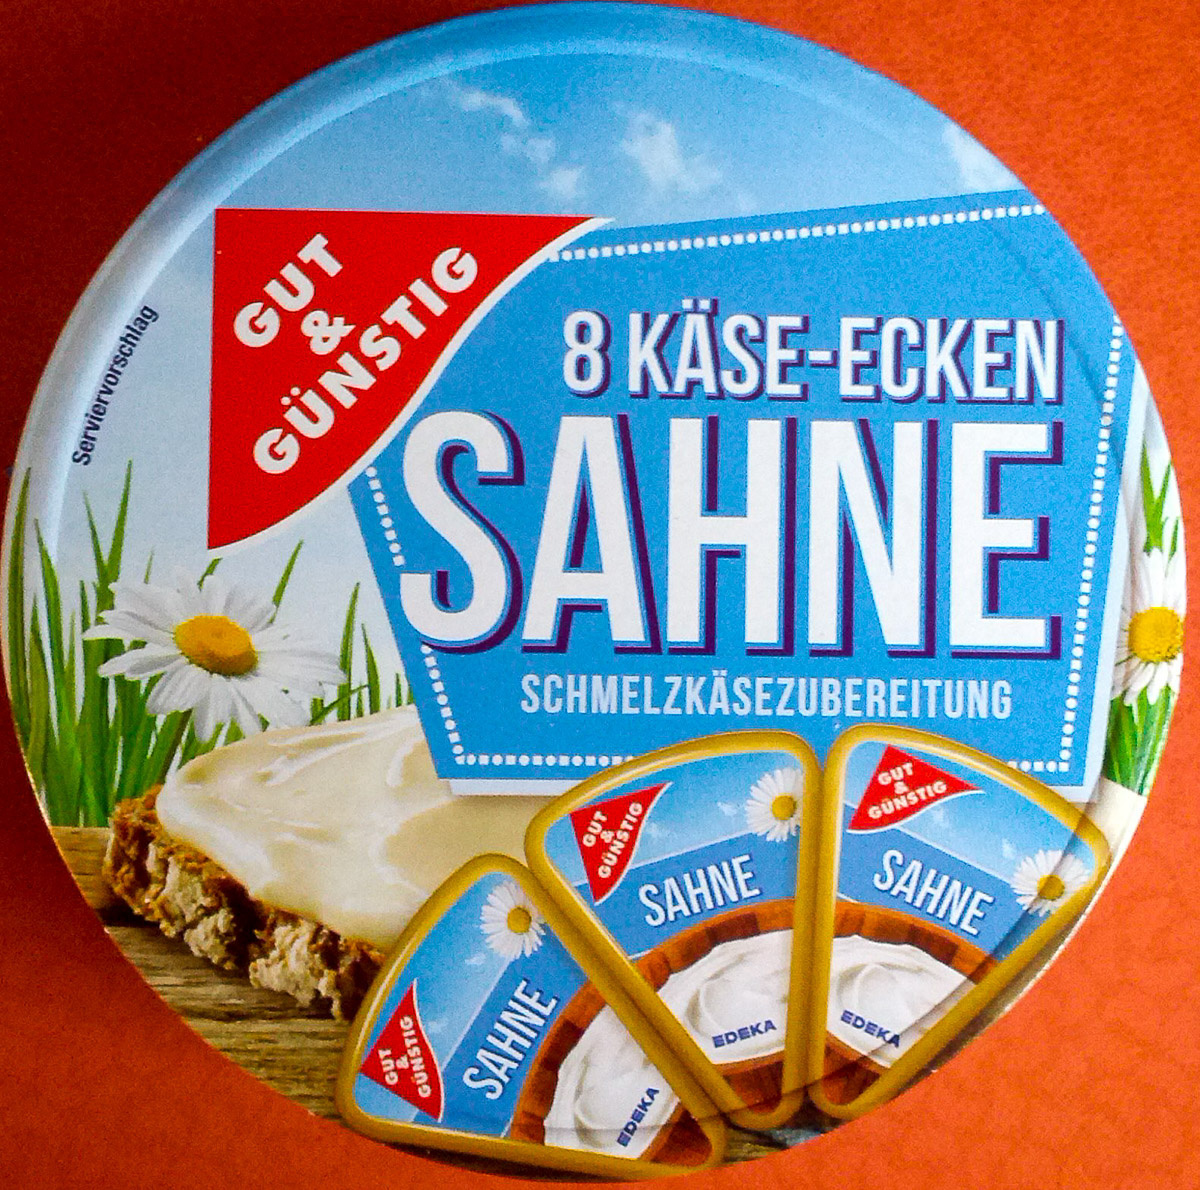 8 Käse-Ecken Sahne - Produit